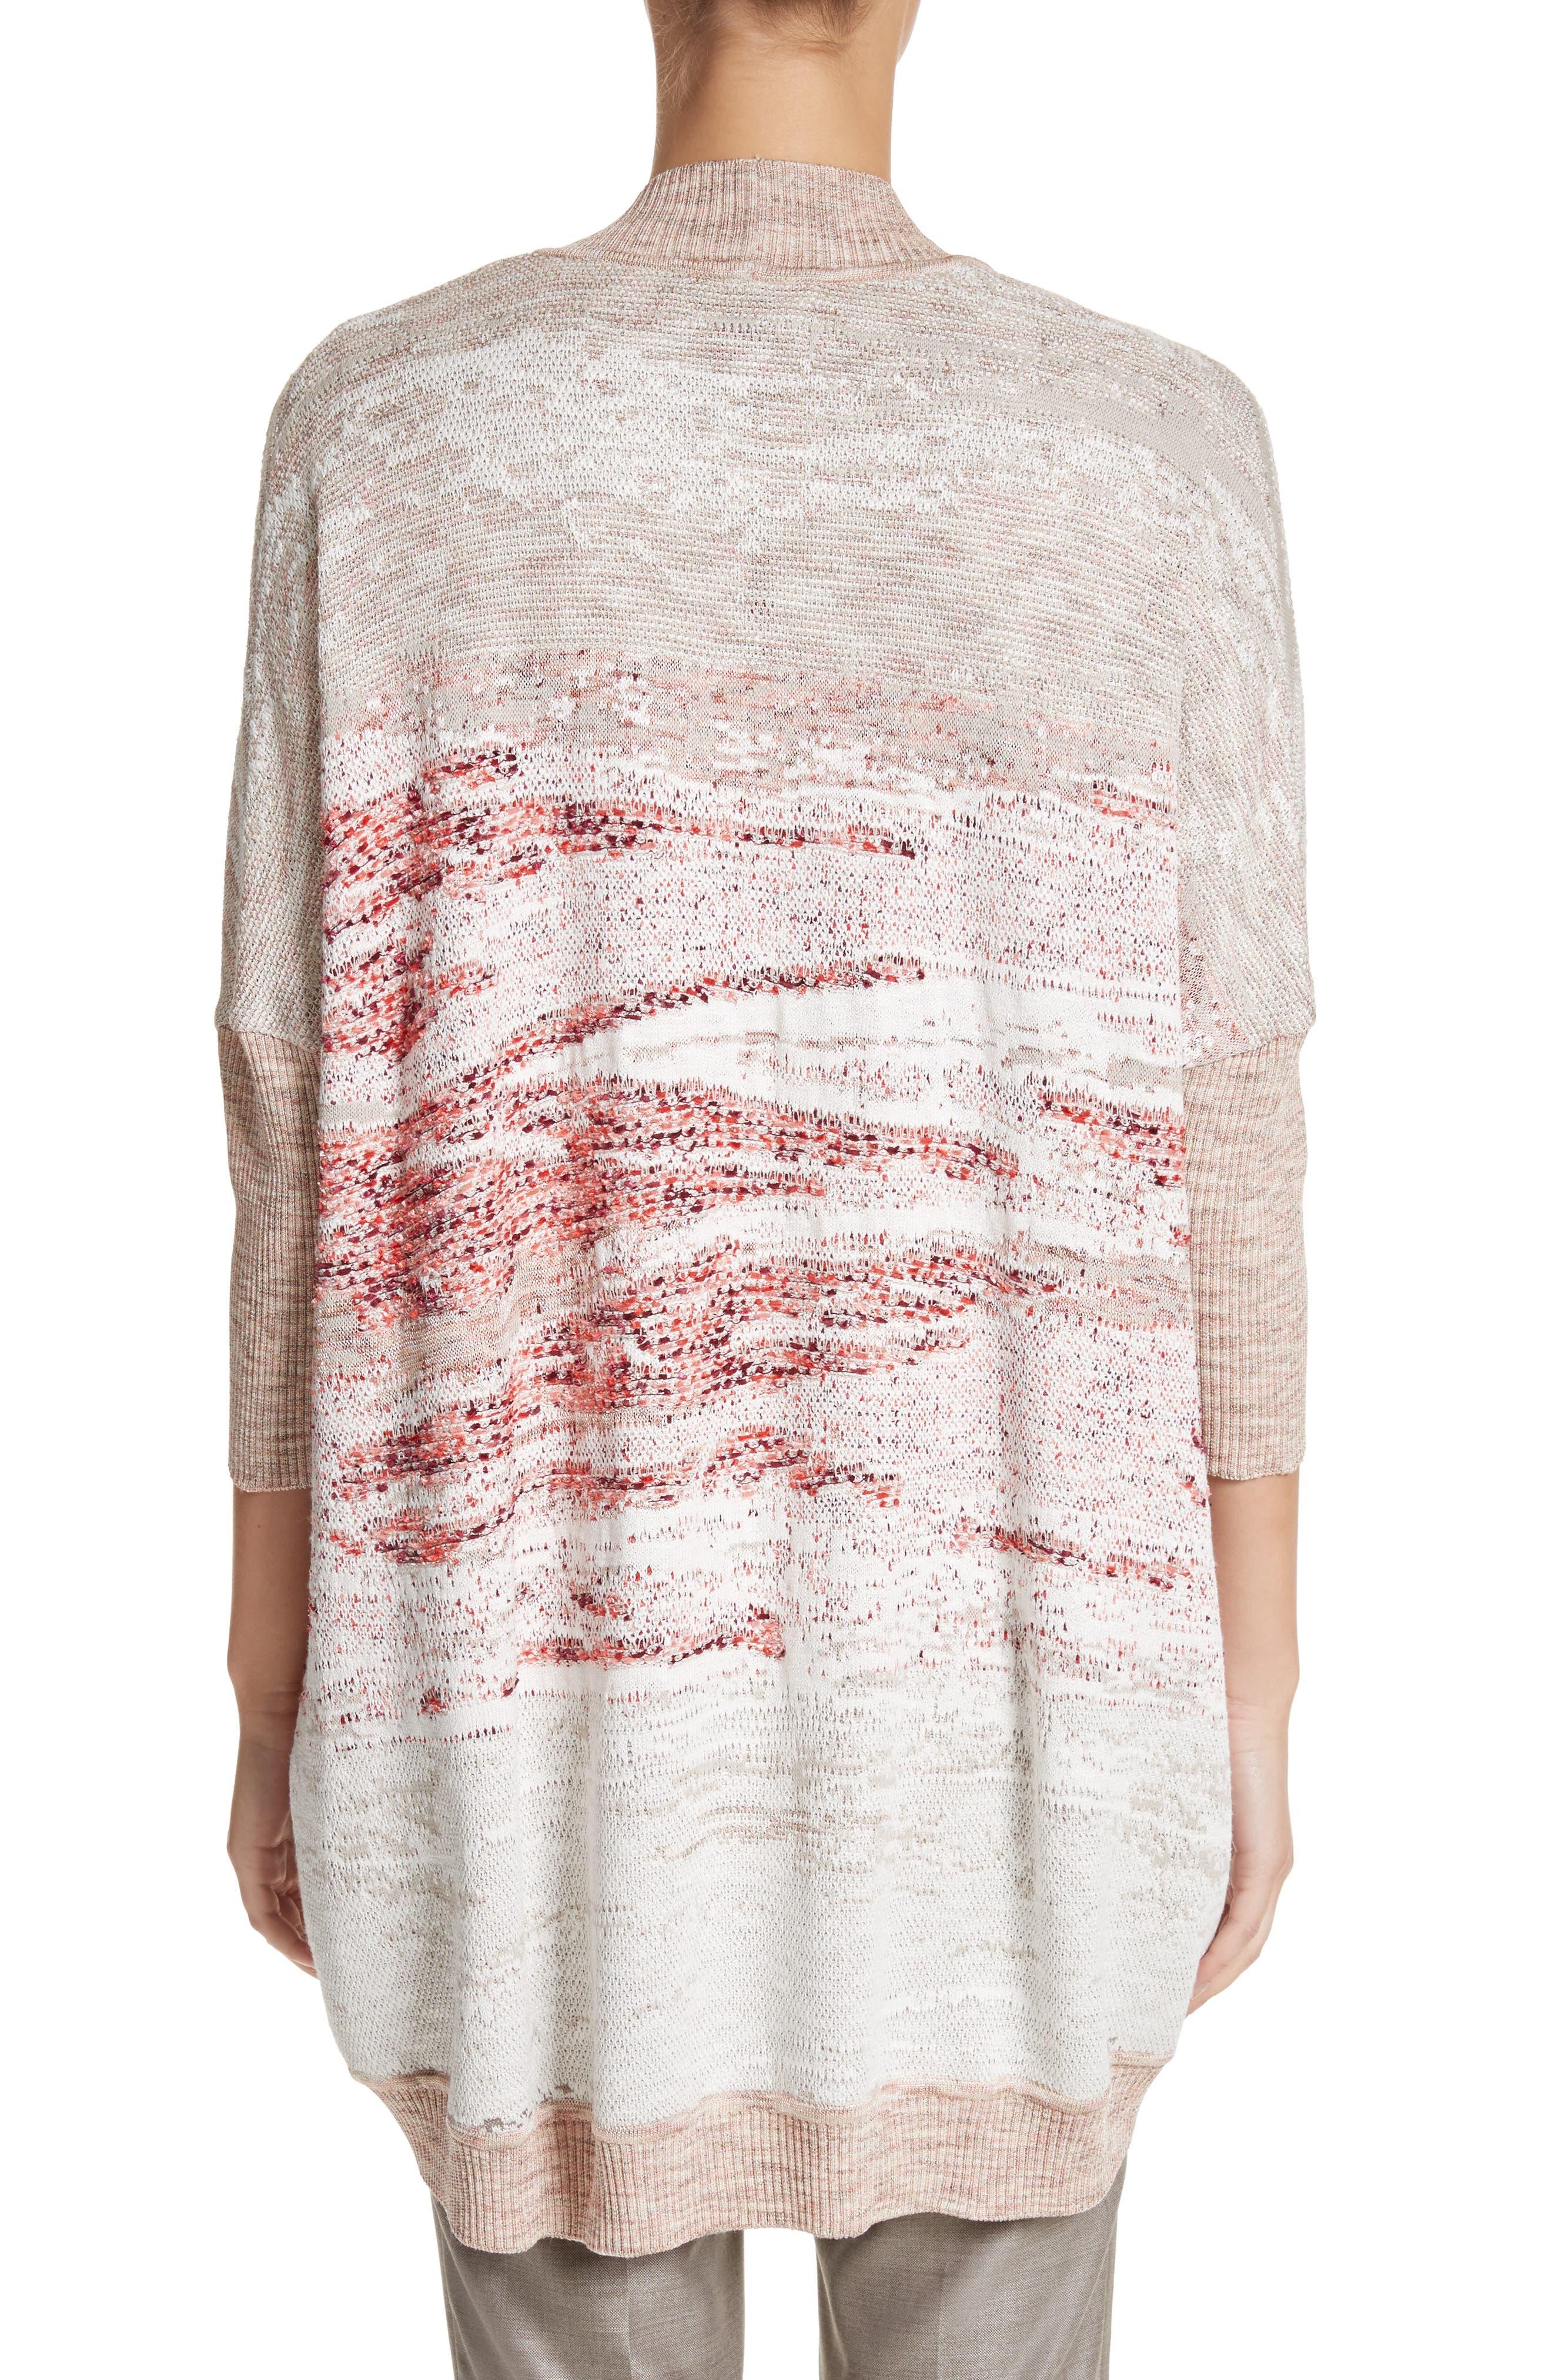 Ombré Textured Jacquard Knit Cardigan,                             Alternate thumbnail 2, color,                             050